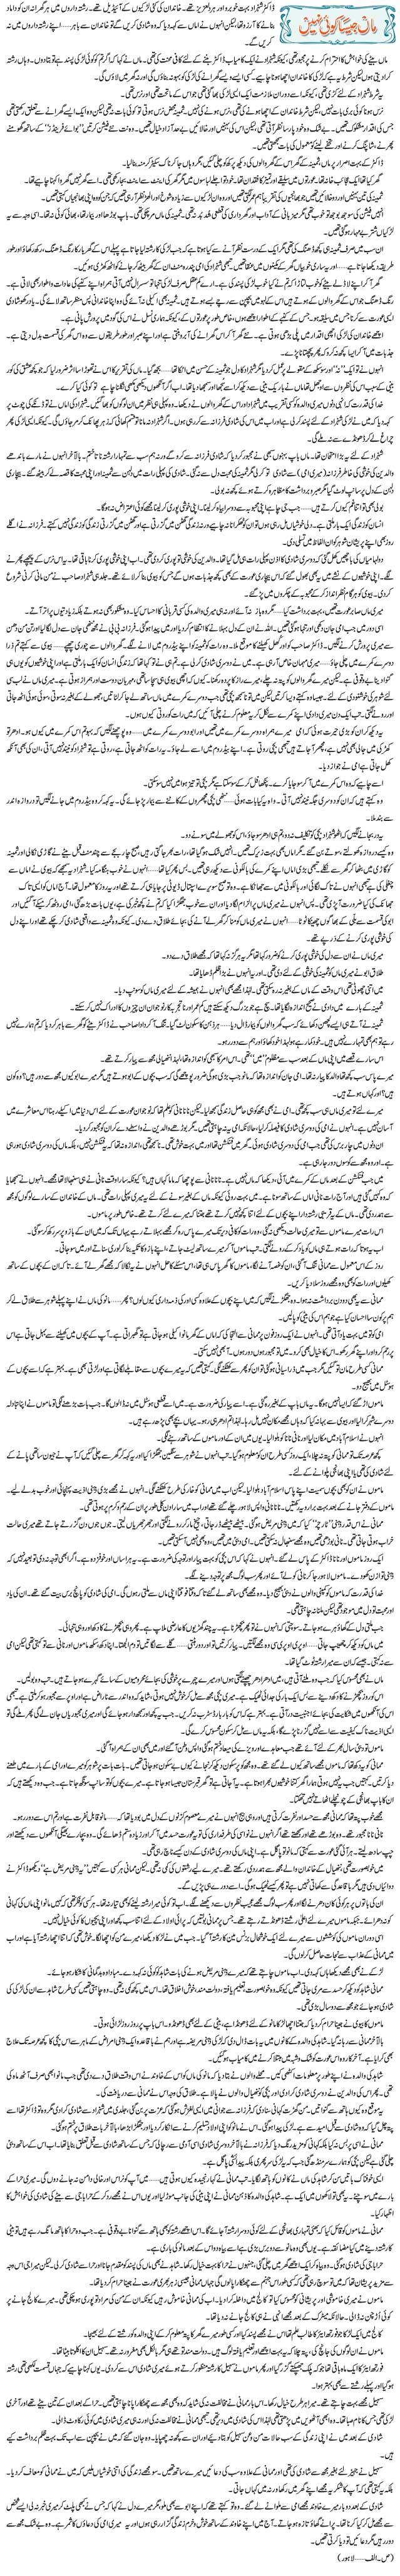 maa-jaisa-koi-nahi-teen-auratien-teen-kahaniyan-akhbar-e-jehan-magazine